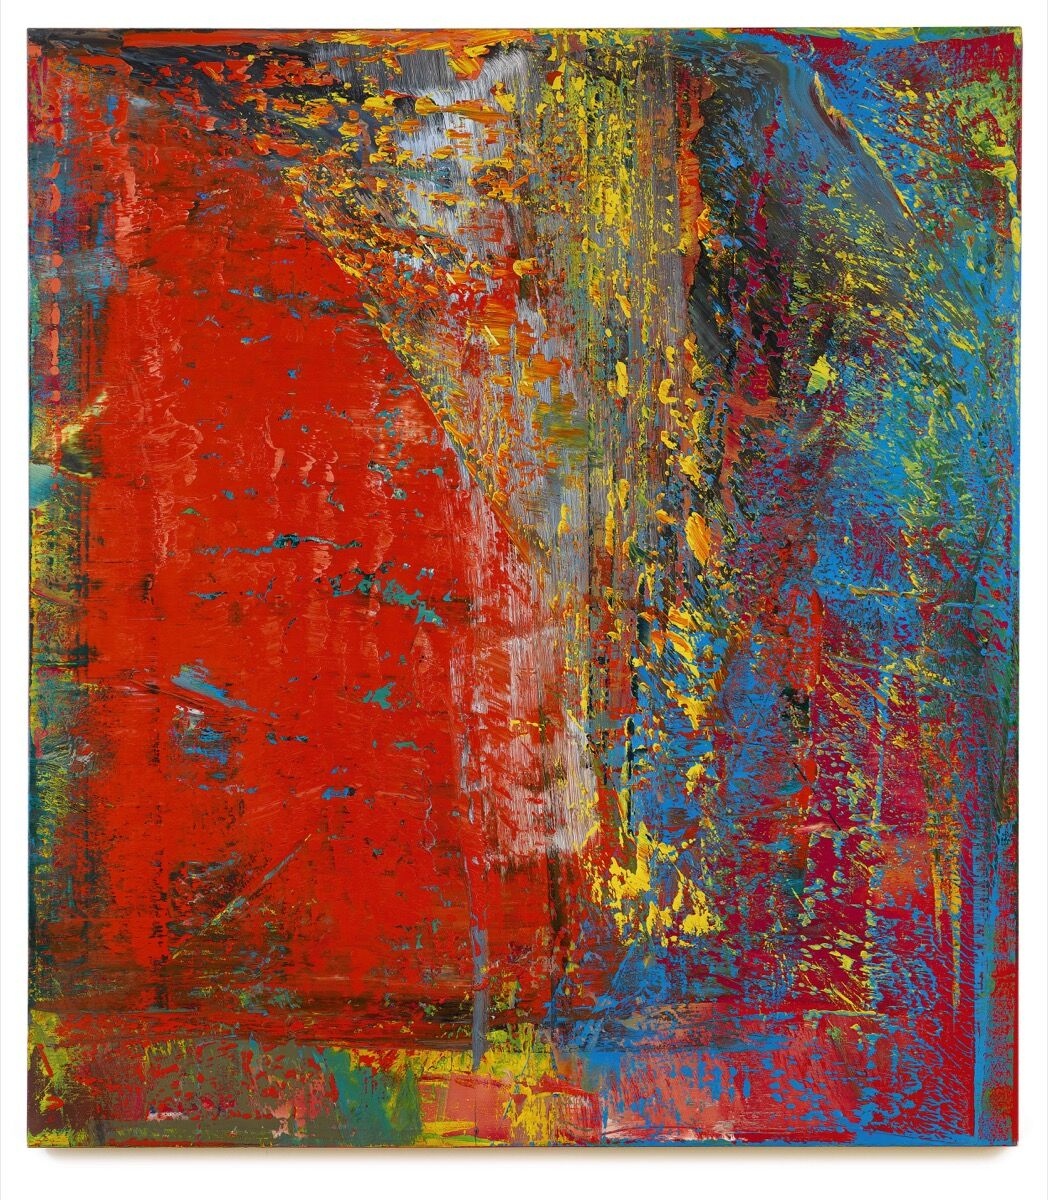 Gerhard Richter,A B, Still, 1986. © Gerhard Richter, 2016. Image courtesy of Sotheby's.